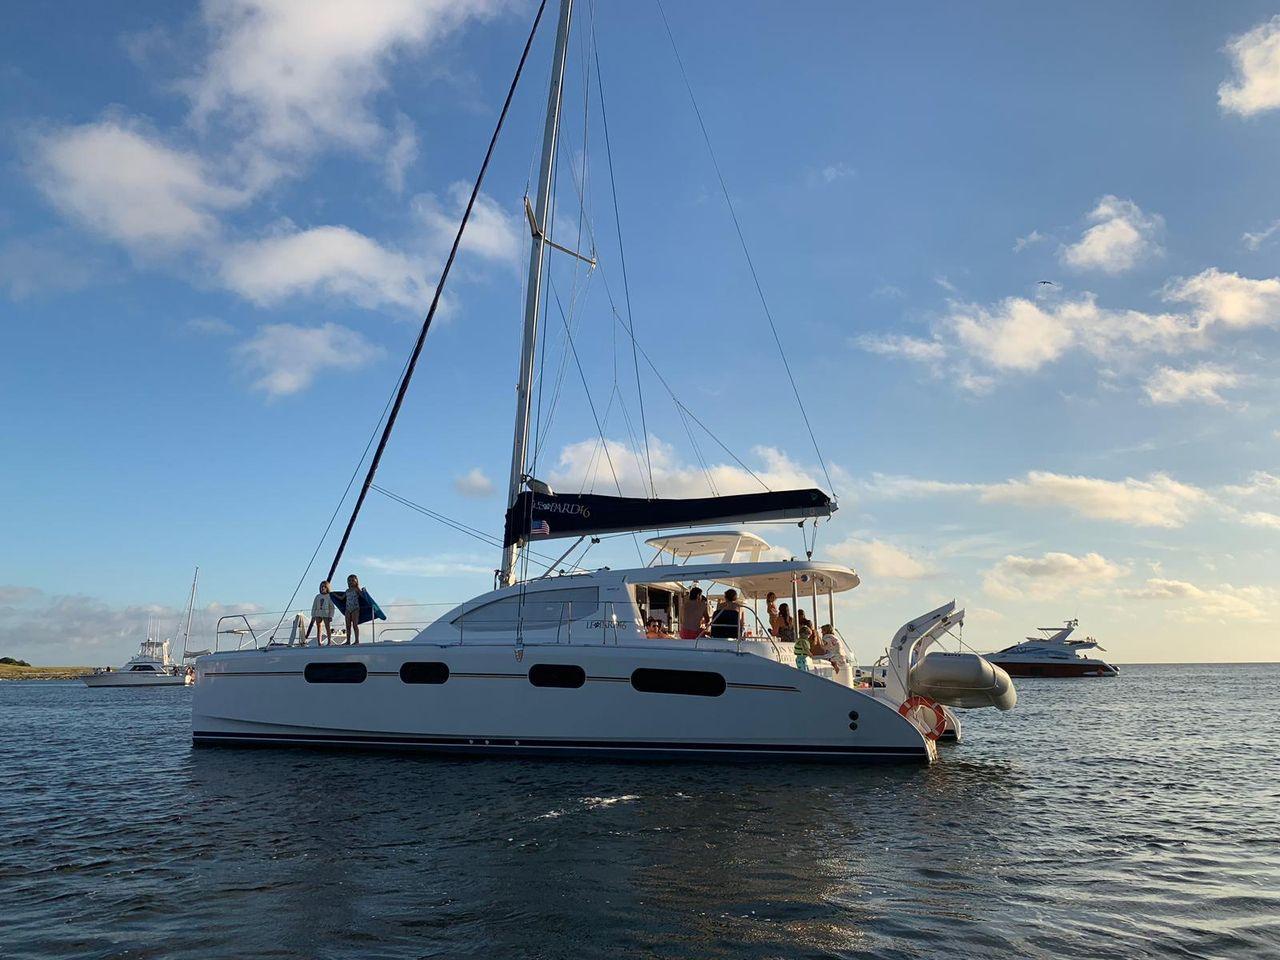 2012 Used Leopard 46 Catamaran Sailboat For Sale ...